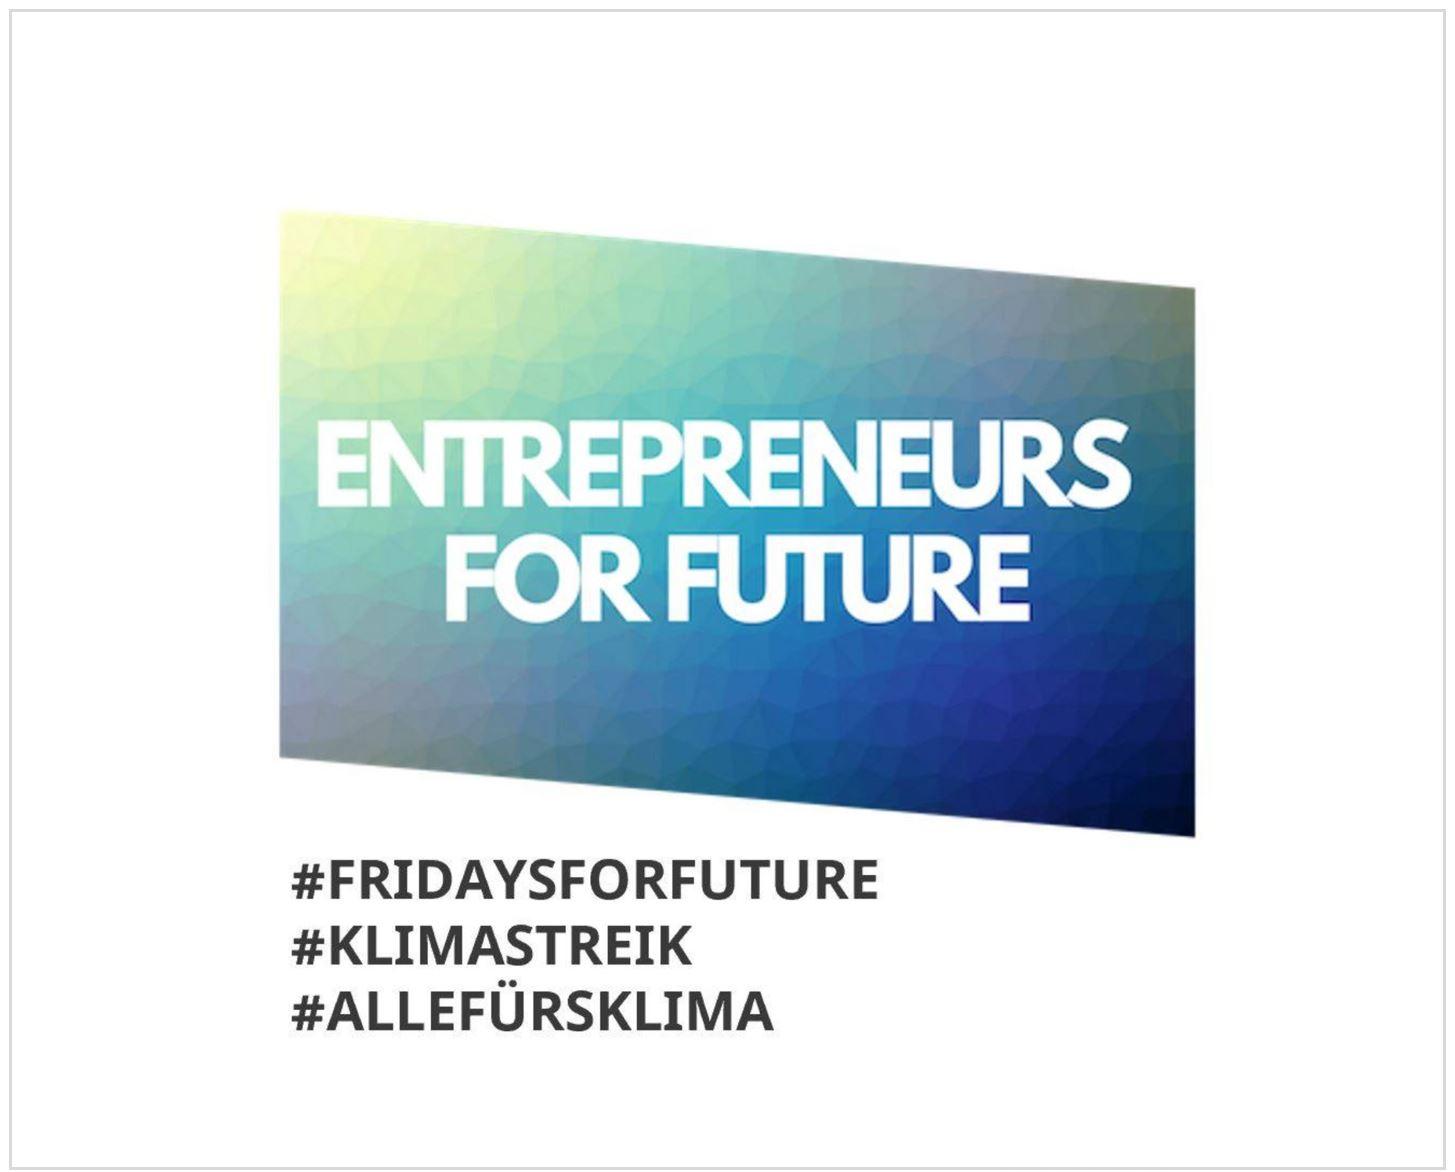 Fridays for future mit stadtmobil